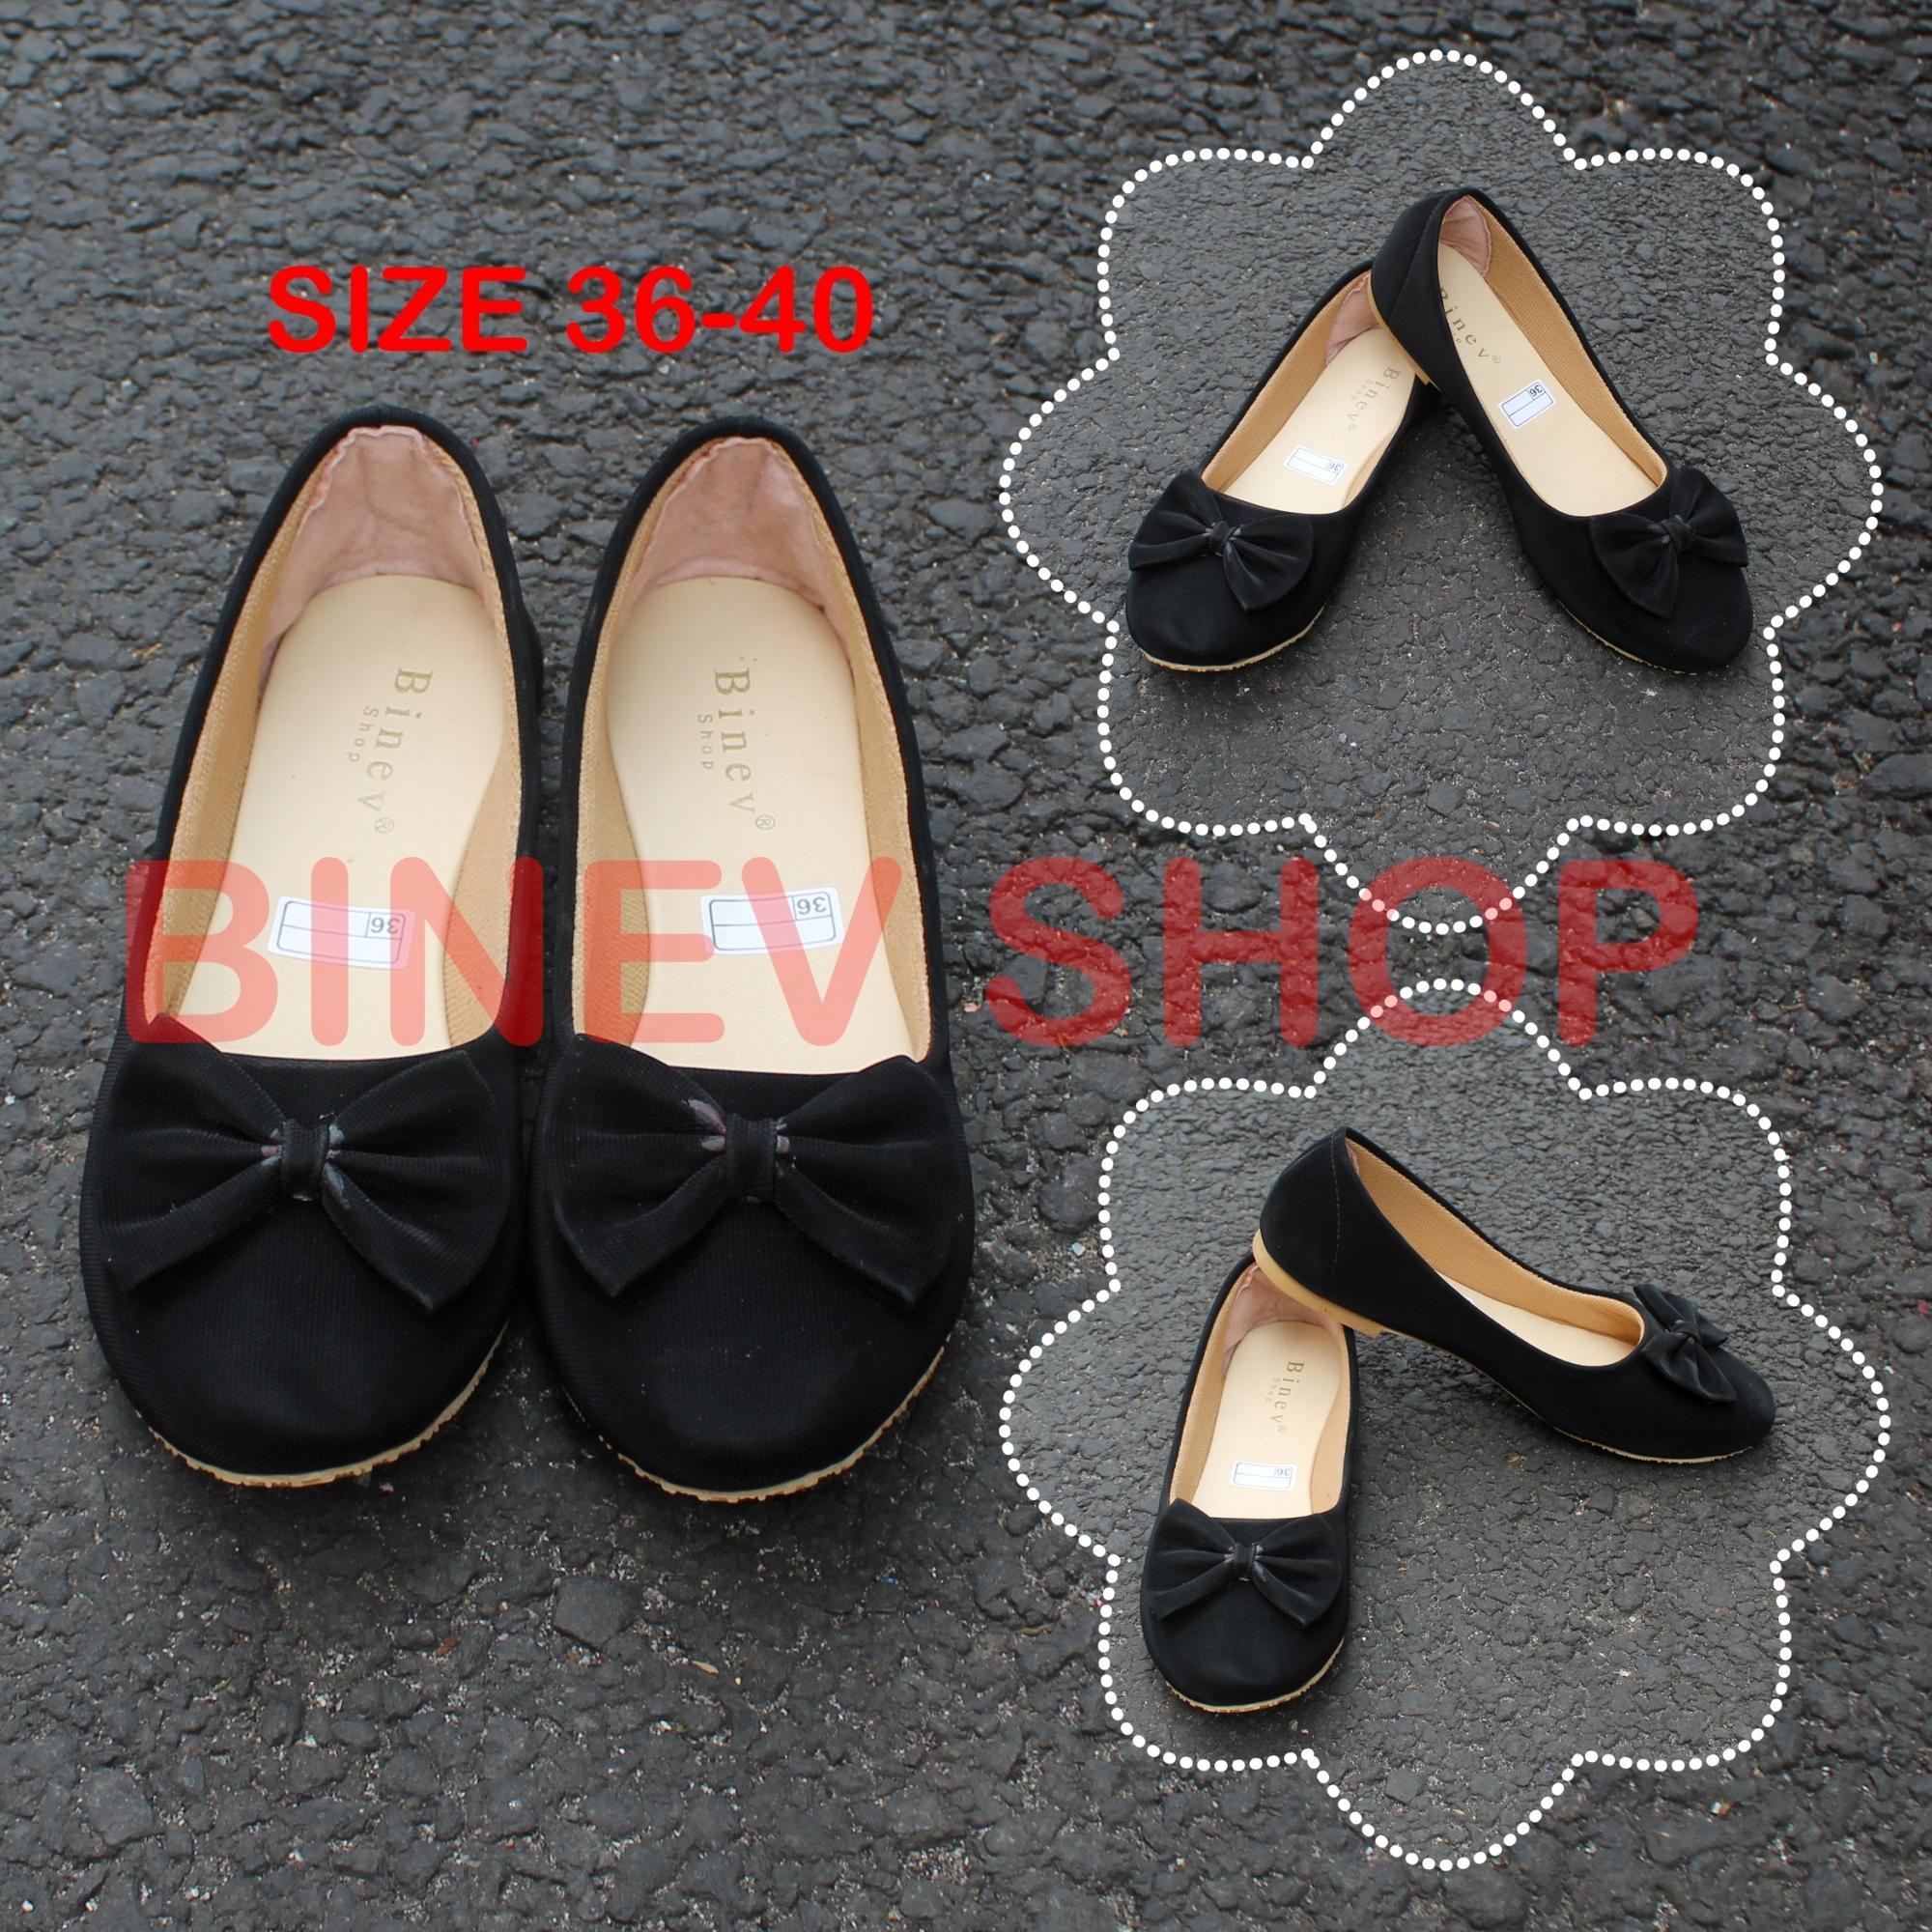 Binev Sepatu Slip On Wanita Develop 001 Tan Update Daftar Harga 0010 Blue Best Buy Indonesia